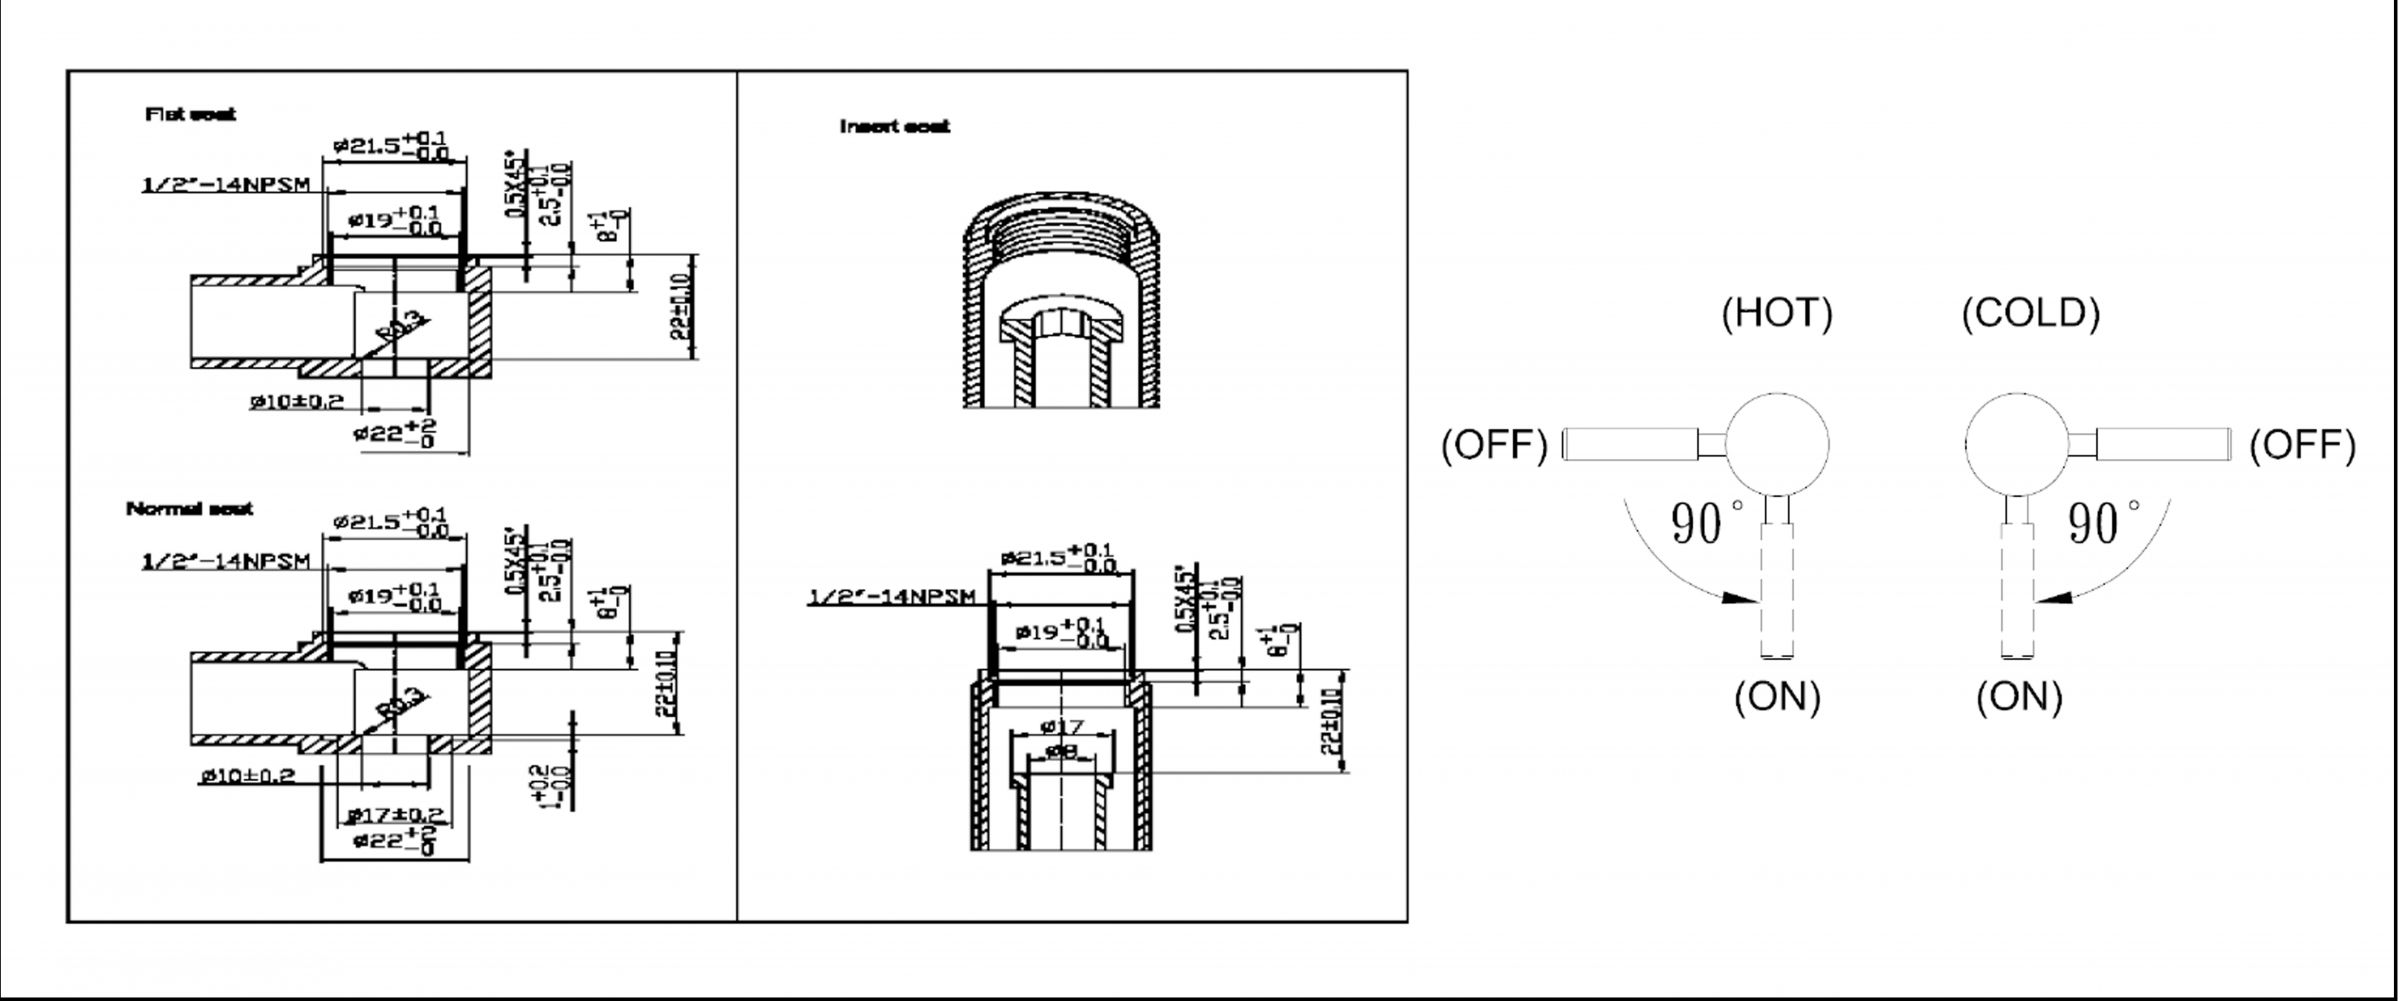 DHDU-Instruction Manual